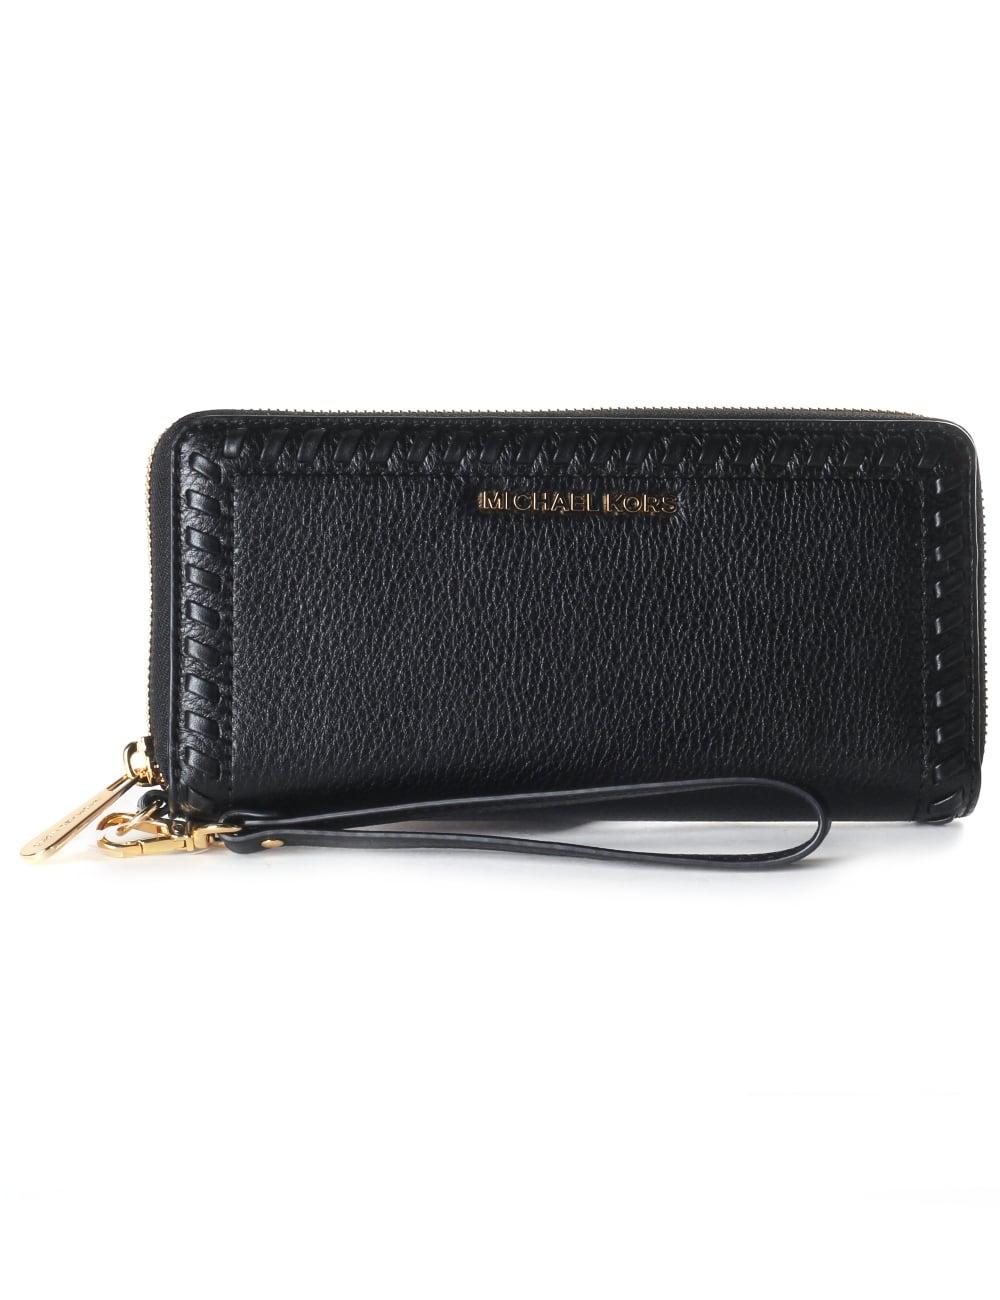 f1b28cdbeadb ... Michael Kors Fulton Large Leather Top Zip Clutch and Wristlet iPhone 6  Plus, iPhone 6s Plus 5.5 Women039s Lauryn Travel Continental Wristlet  Wallet ...